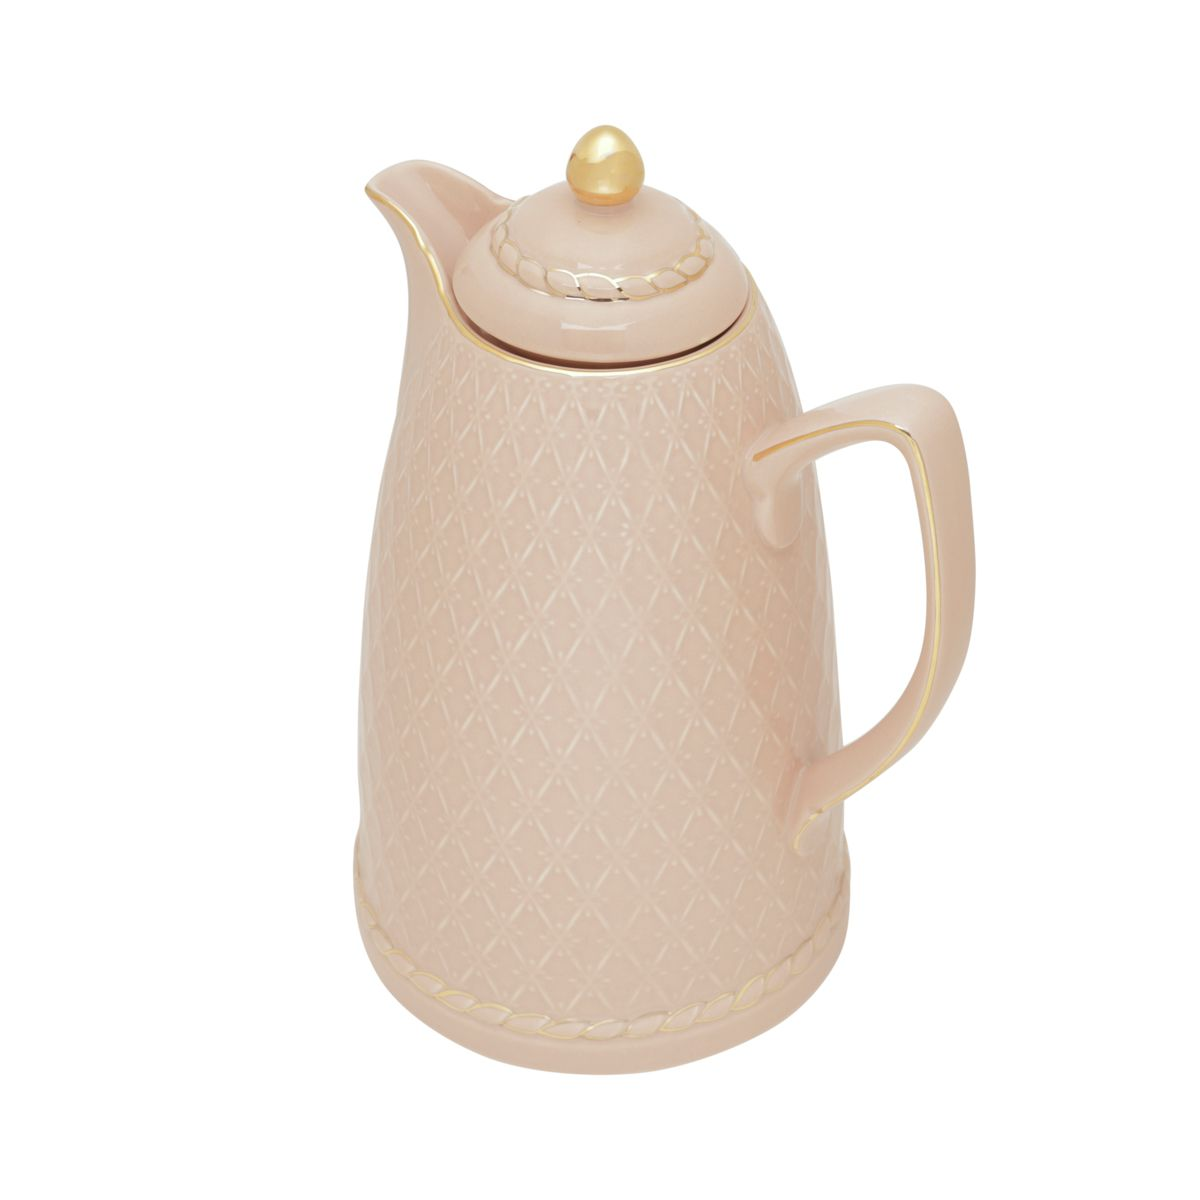 Garrafa Térmica 900ml para café ou chá de porcelana rosa Renda Wolff - 35492